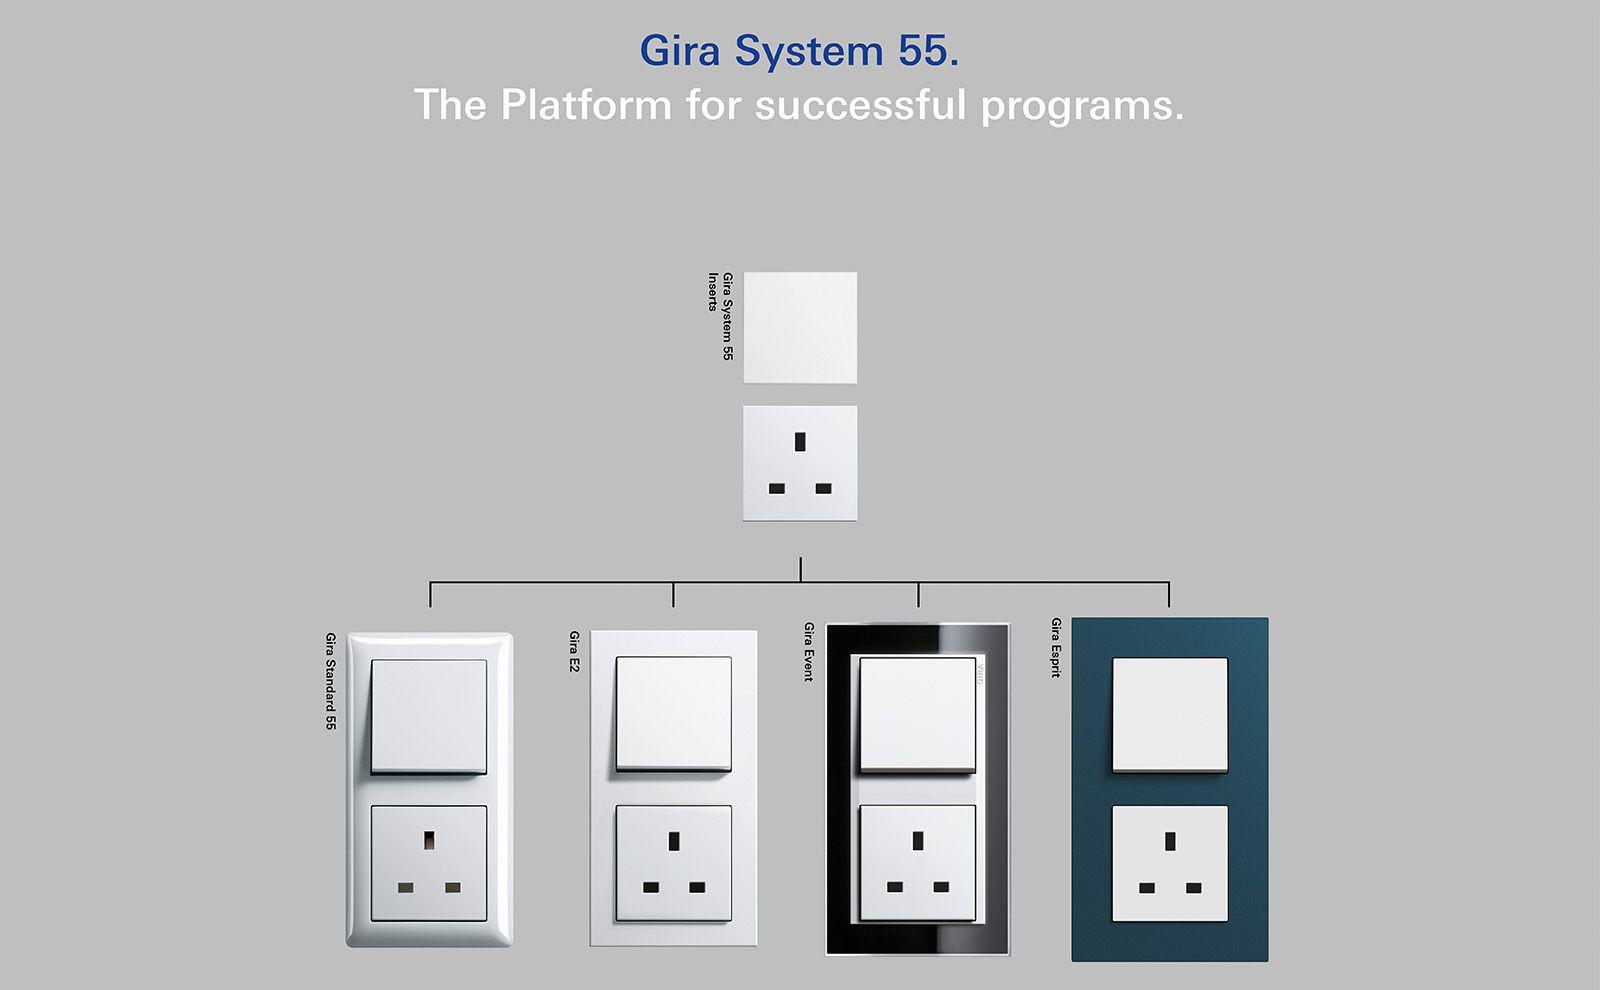 Gira System 55 Schema